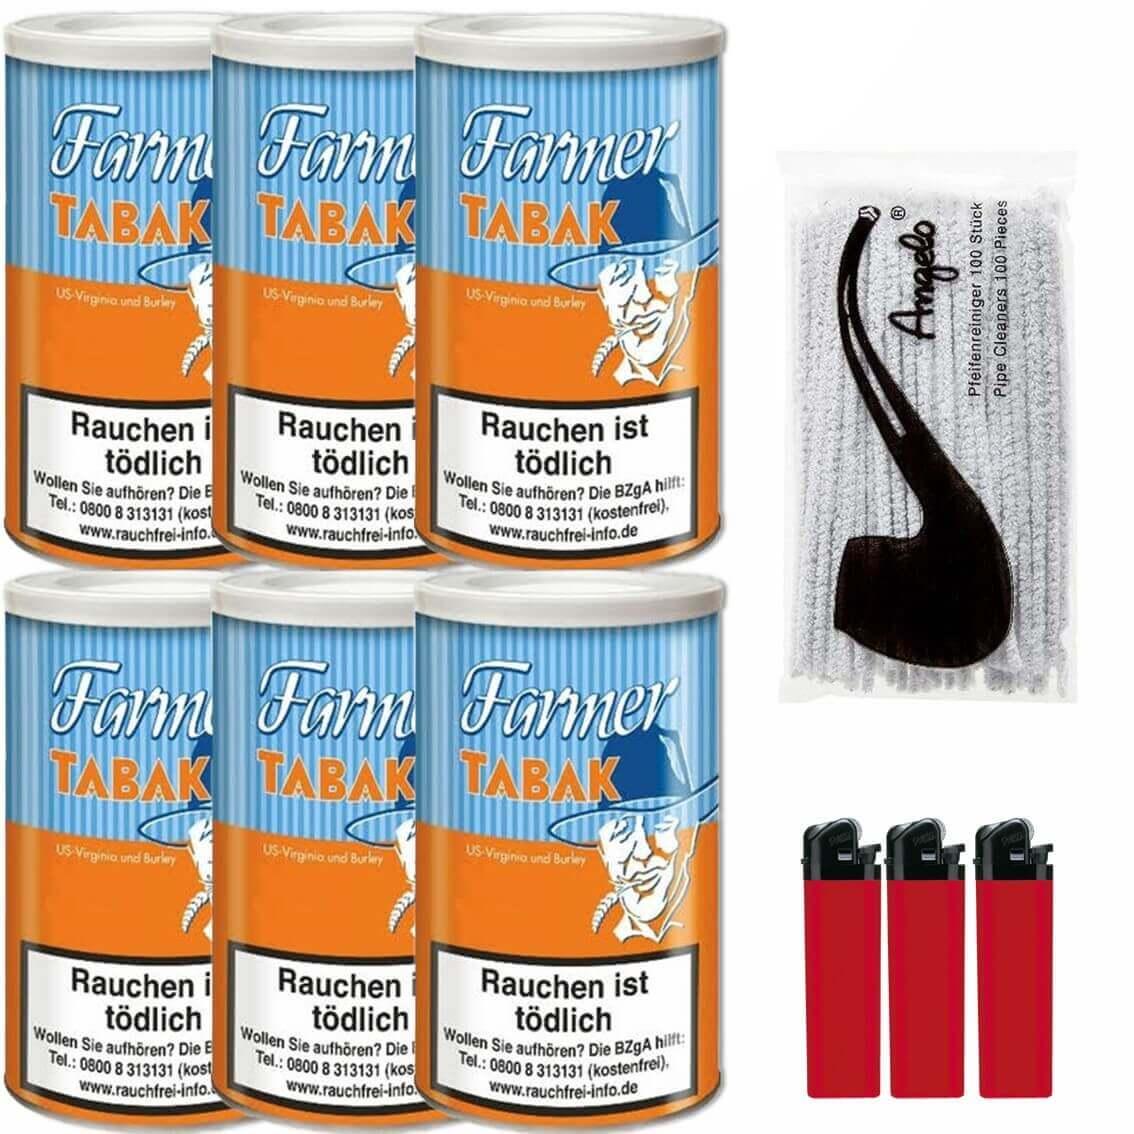 Farmer 6 x 170g Pfeifentabak Feuerzeuge Pfeifenreiniger